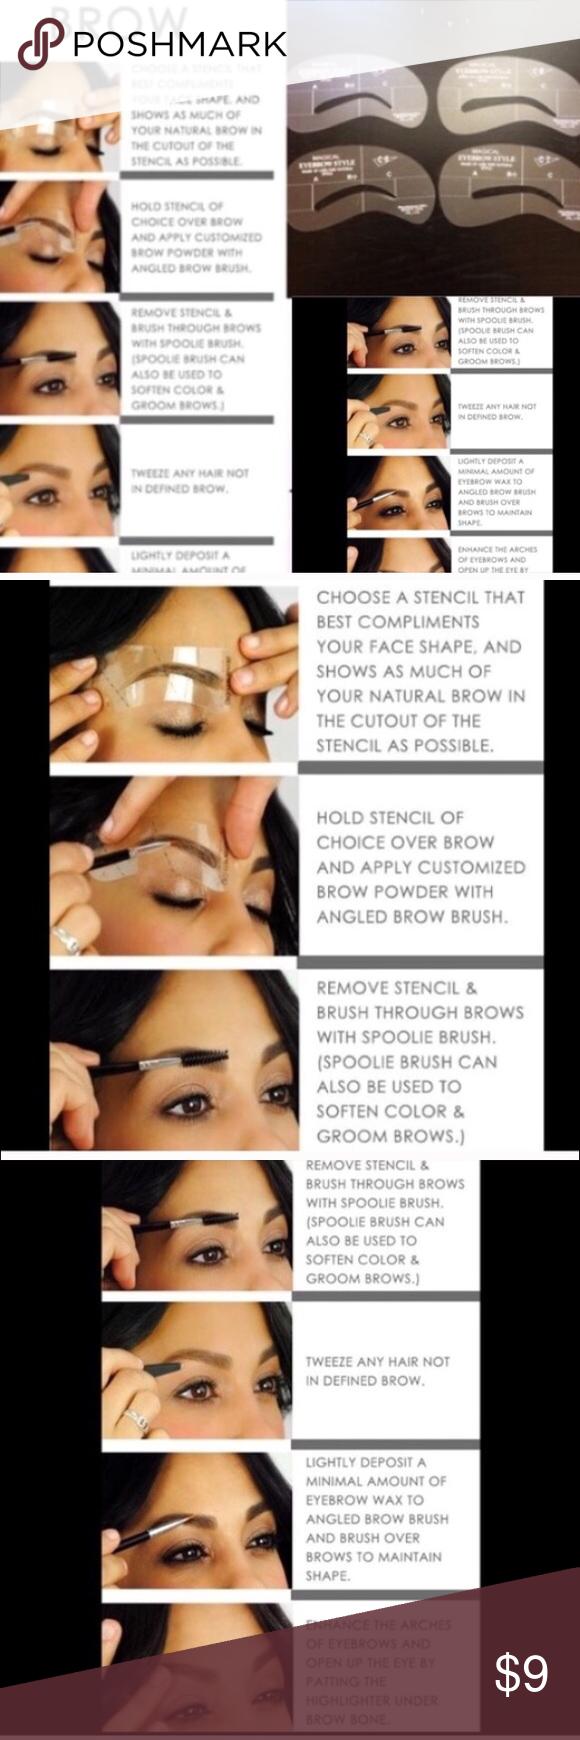 4 Pcs Eyebrow Stencils Brand New Listing Includes Four Eyebrow